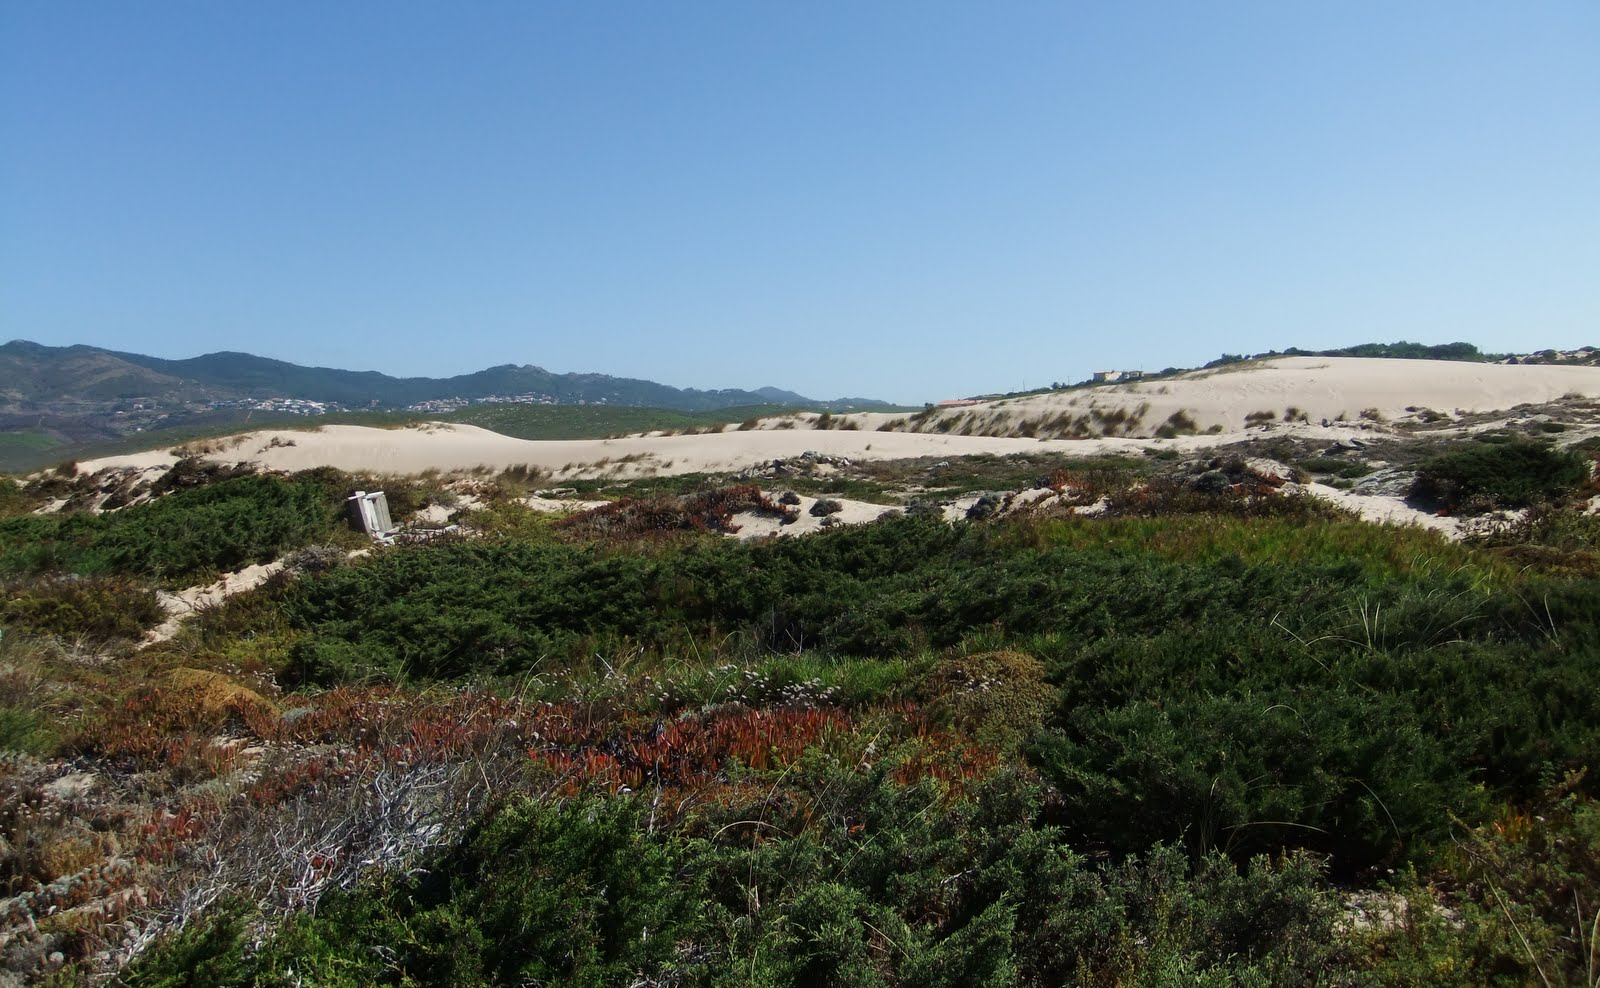 Blog de los espacios protegidos en espa a parque natural - Natura portugal ...